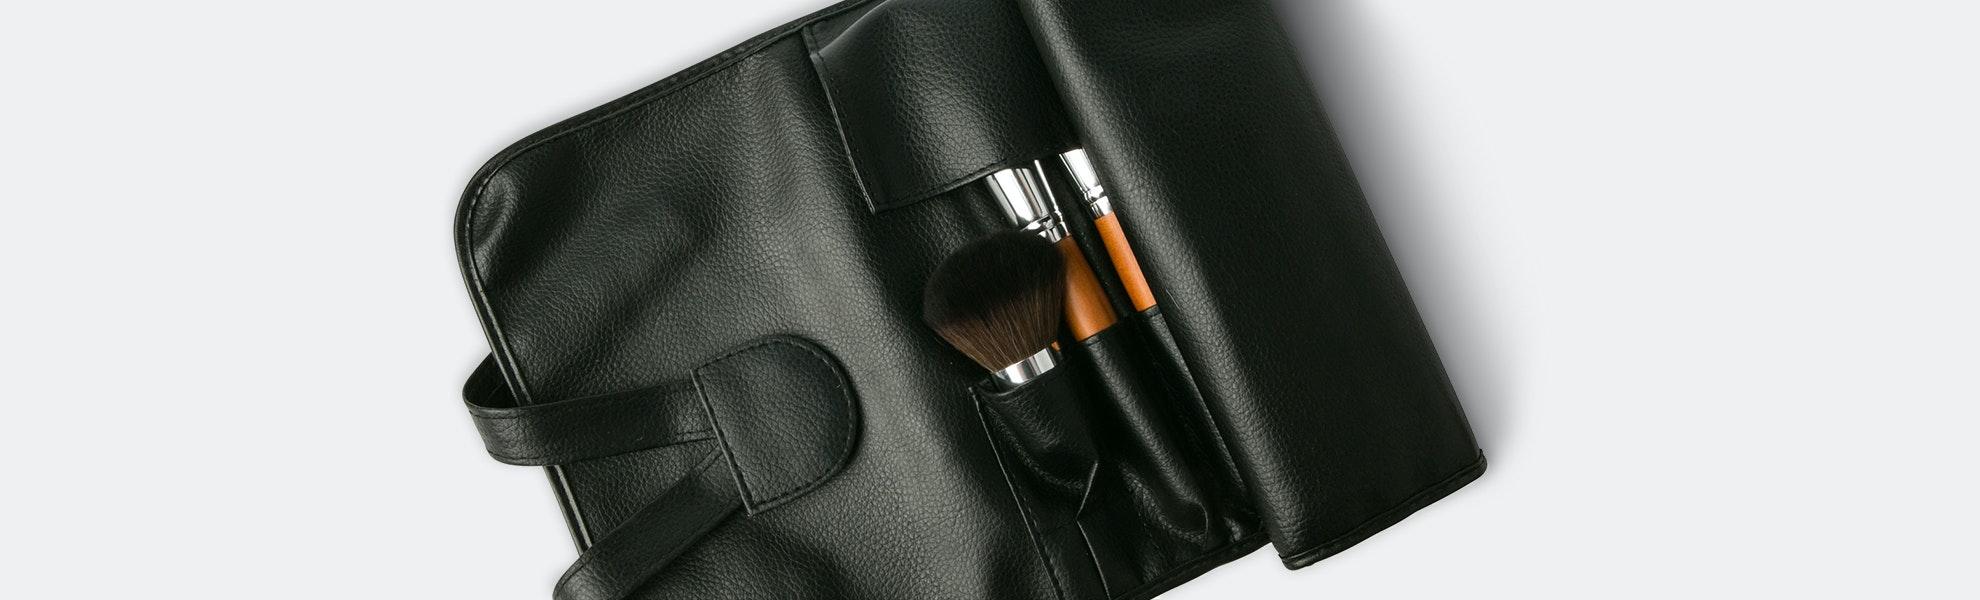 Vanity Planet Palette Makeup Brush Set